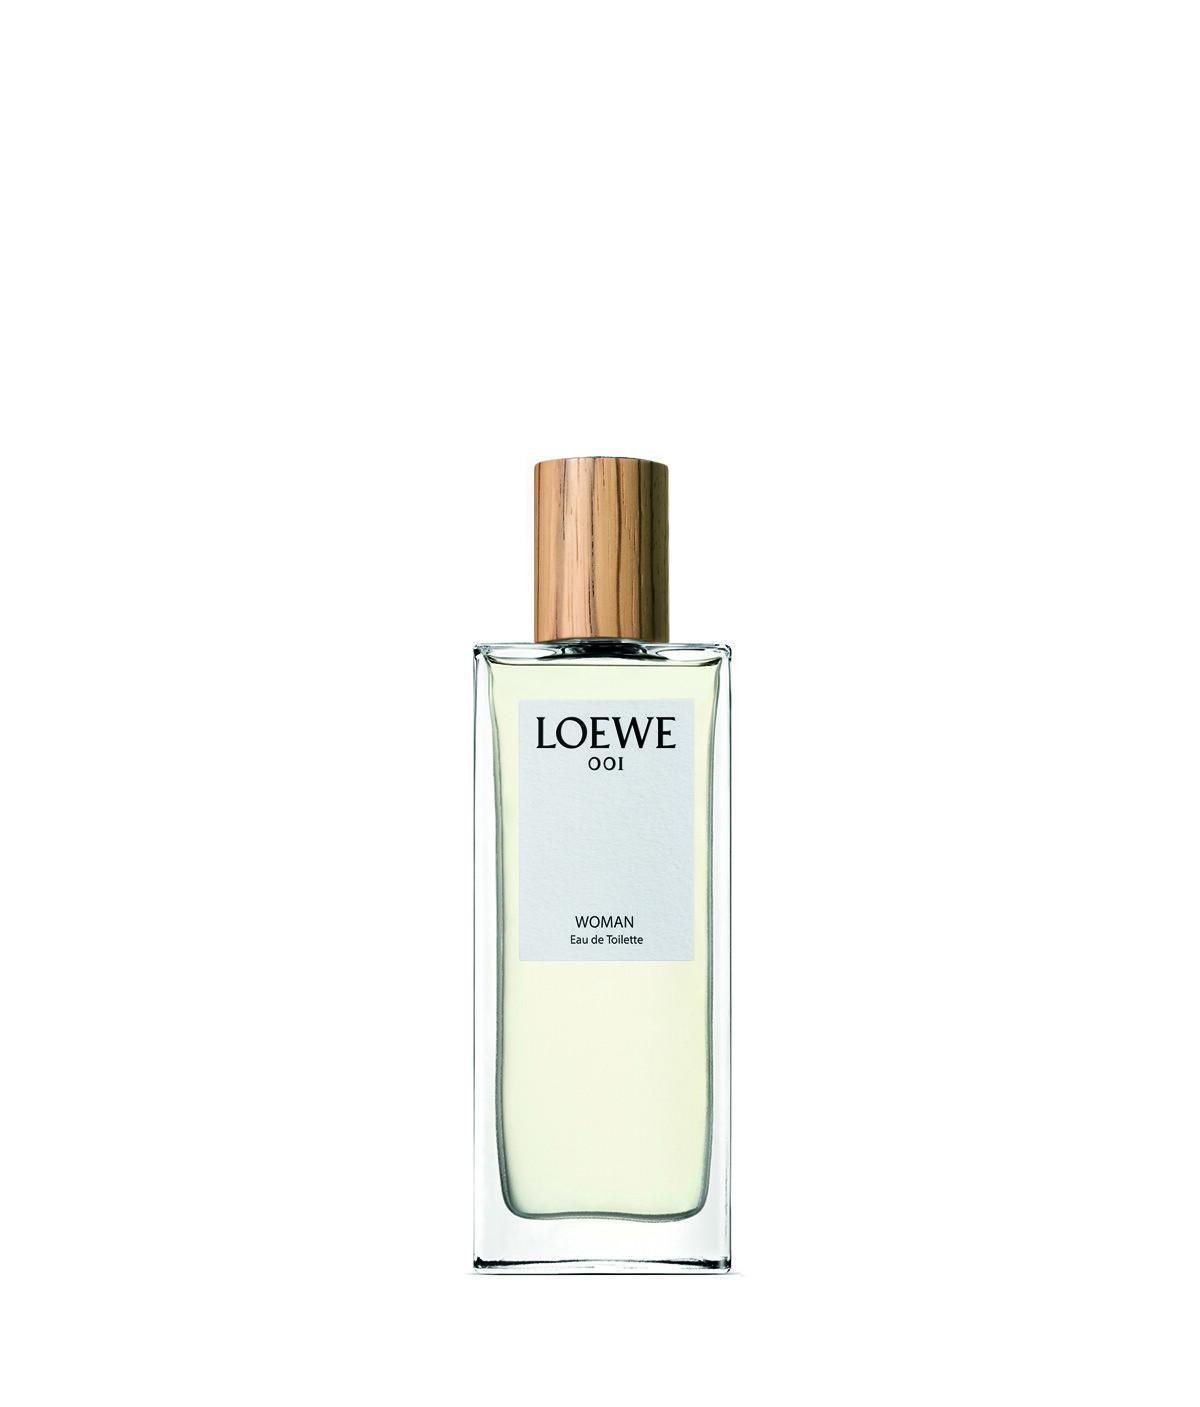 LOEWE Loewe 001 Woman Edt 50Ml Colourless front